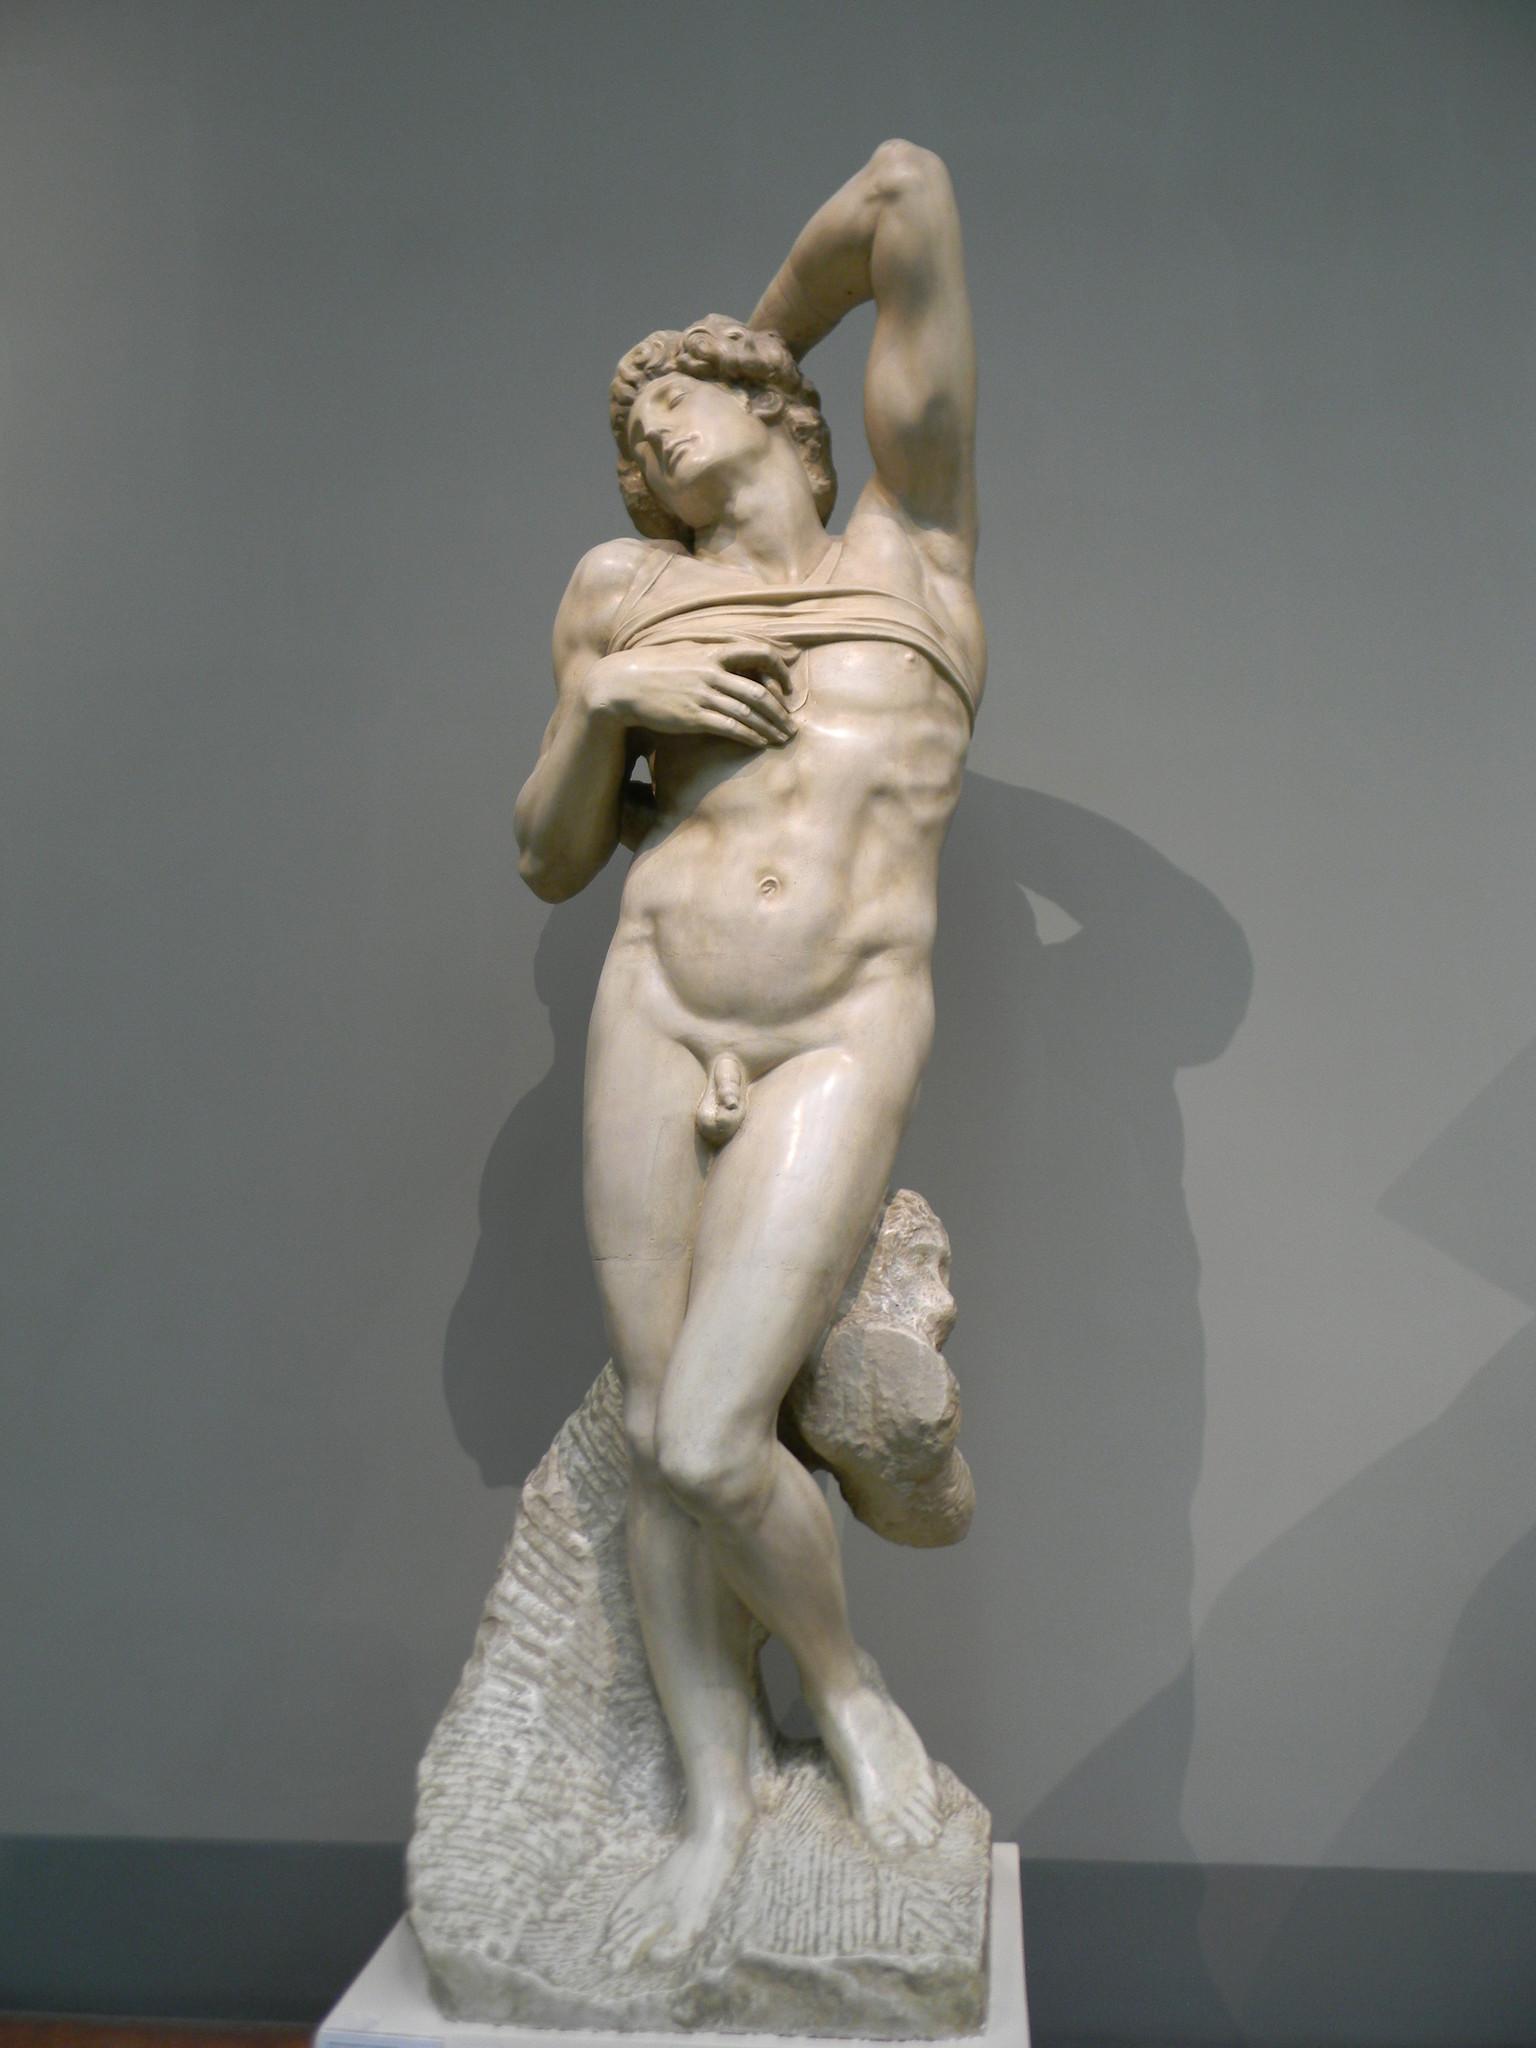 «Умирающий раб». Микеланджело Буонарроти. Слепок. Подлинник - мрамор. Лувр, Париж, Франция